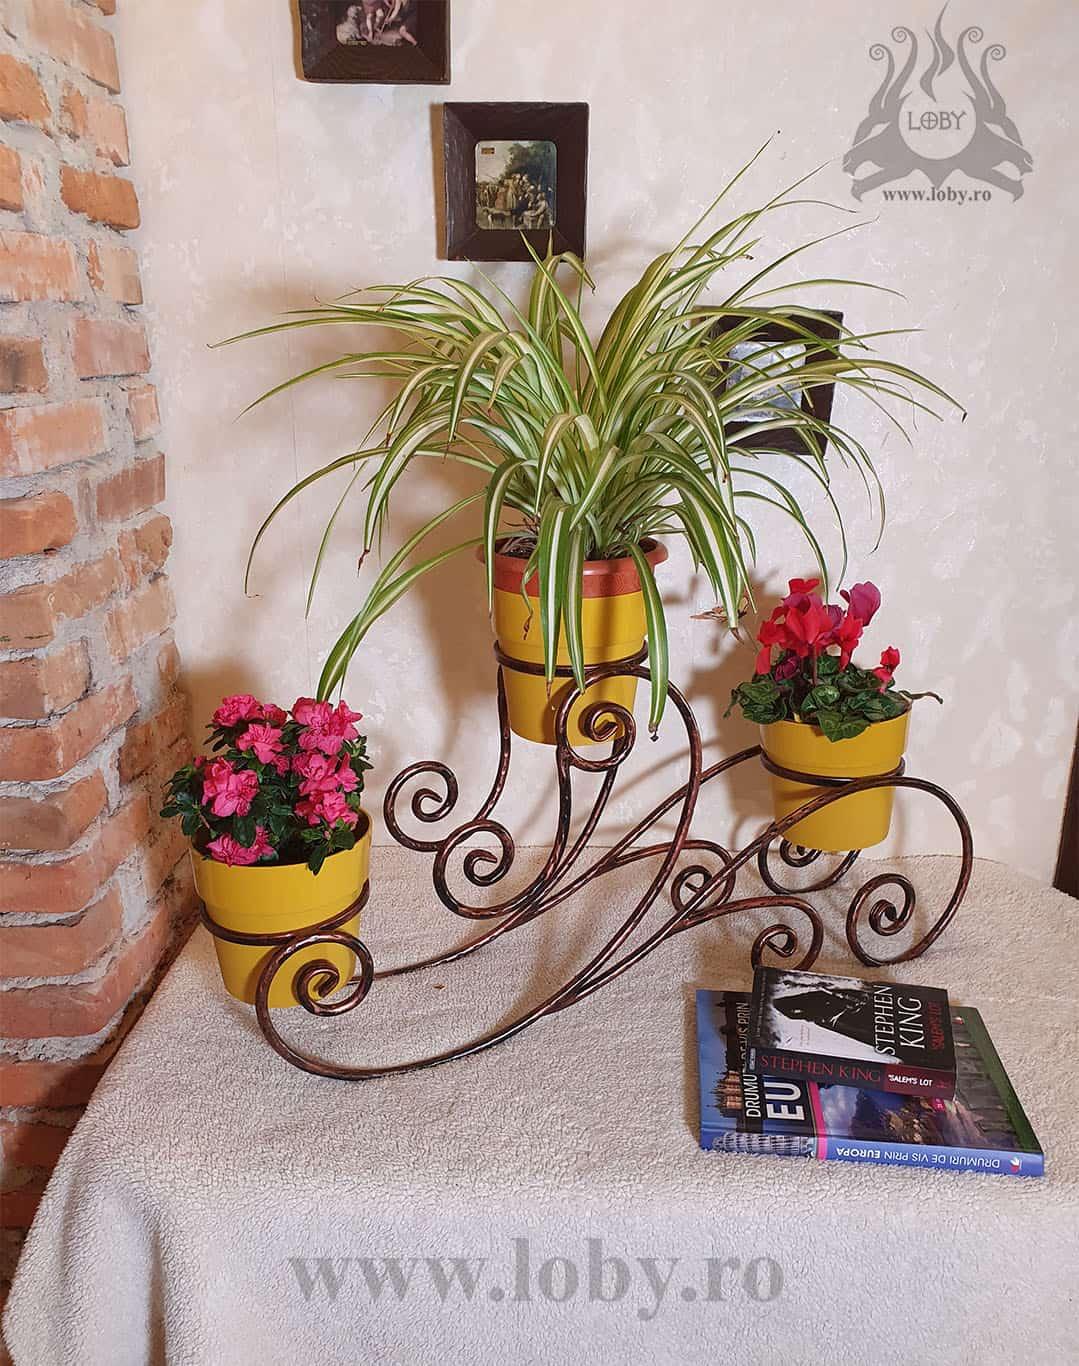 Suport flori din fier forjat rotund cu flori